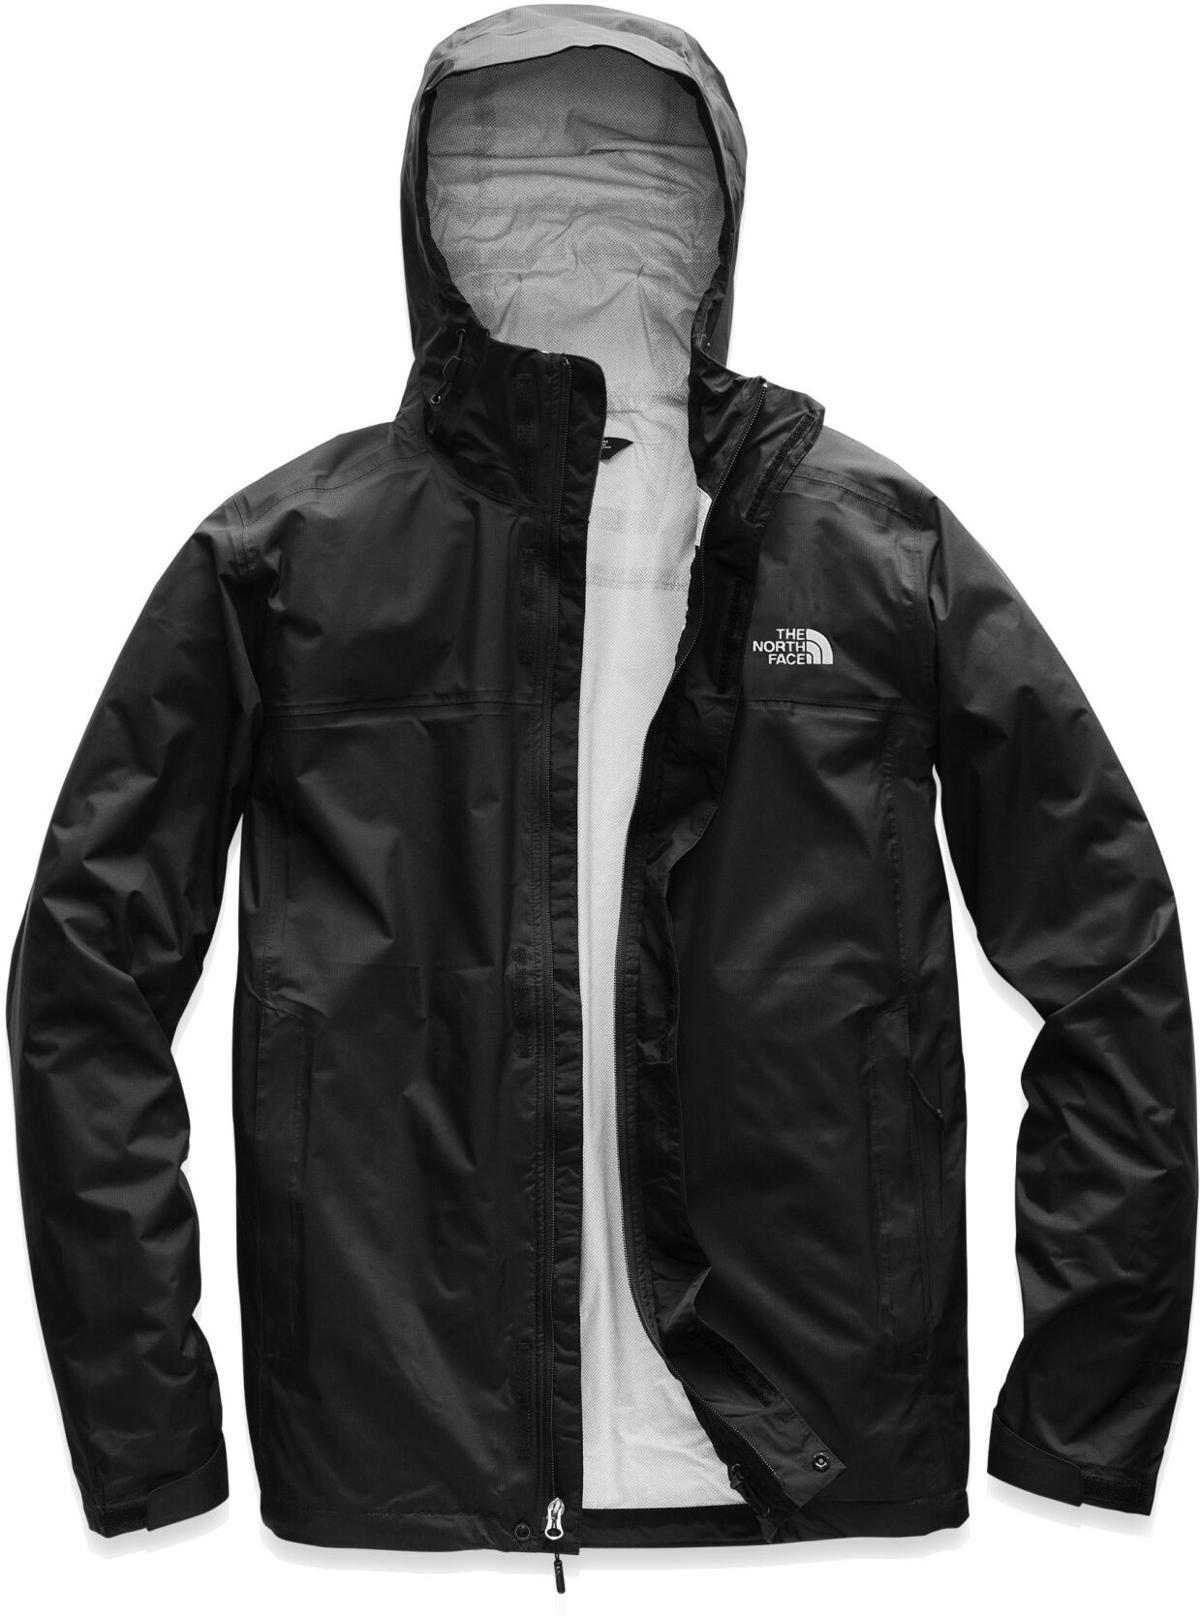 The North Face Venture Rain Jacket